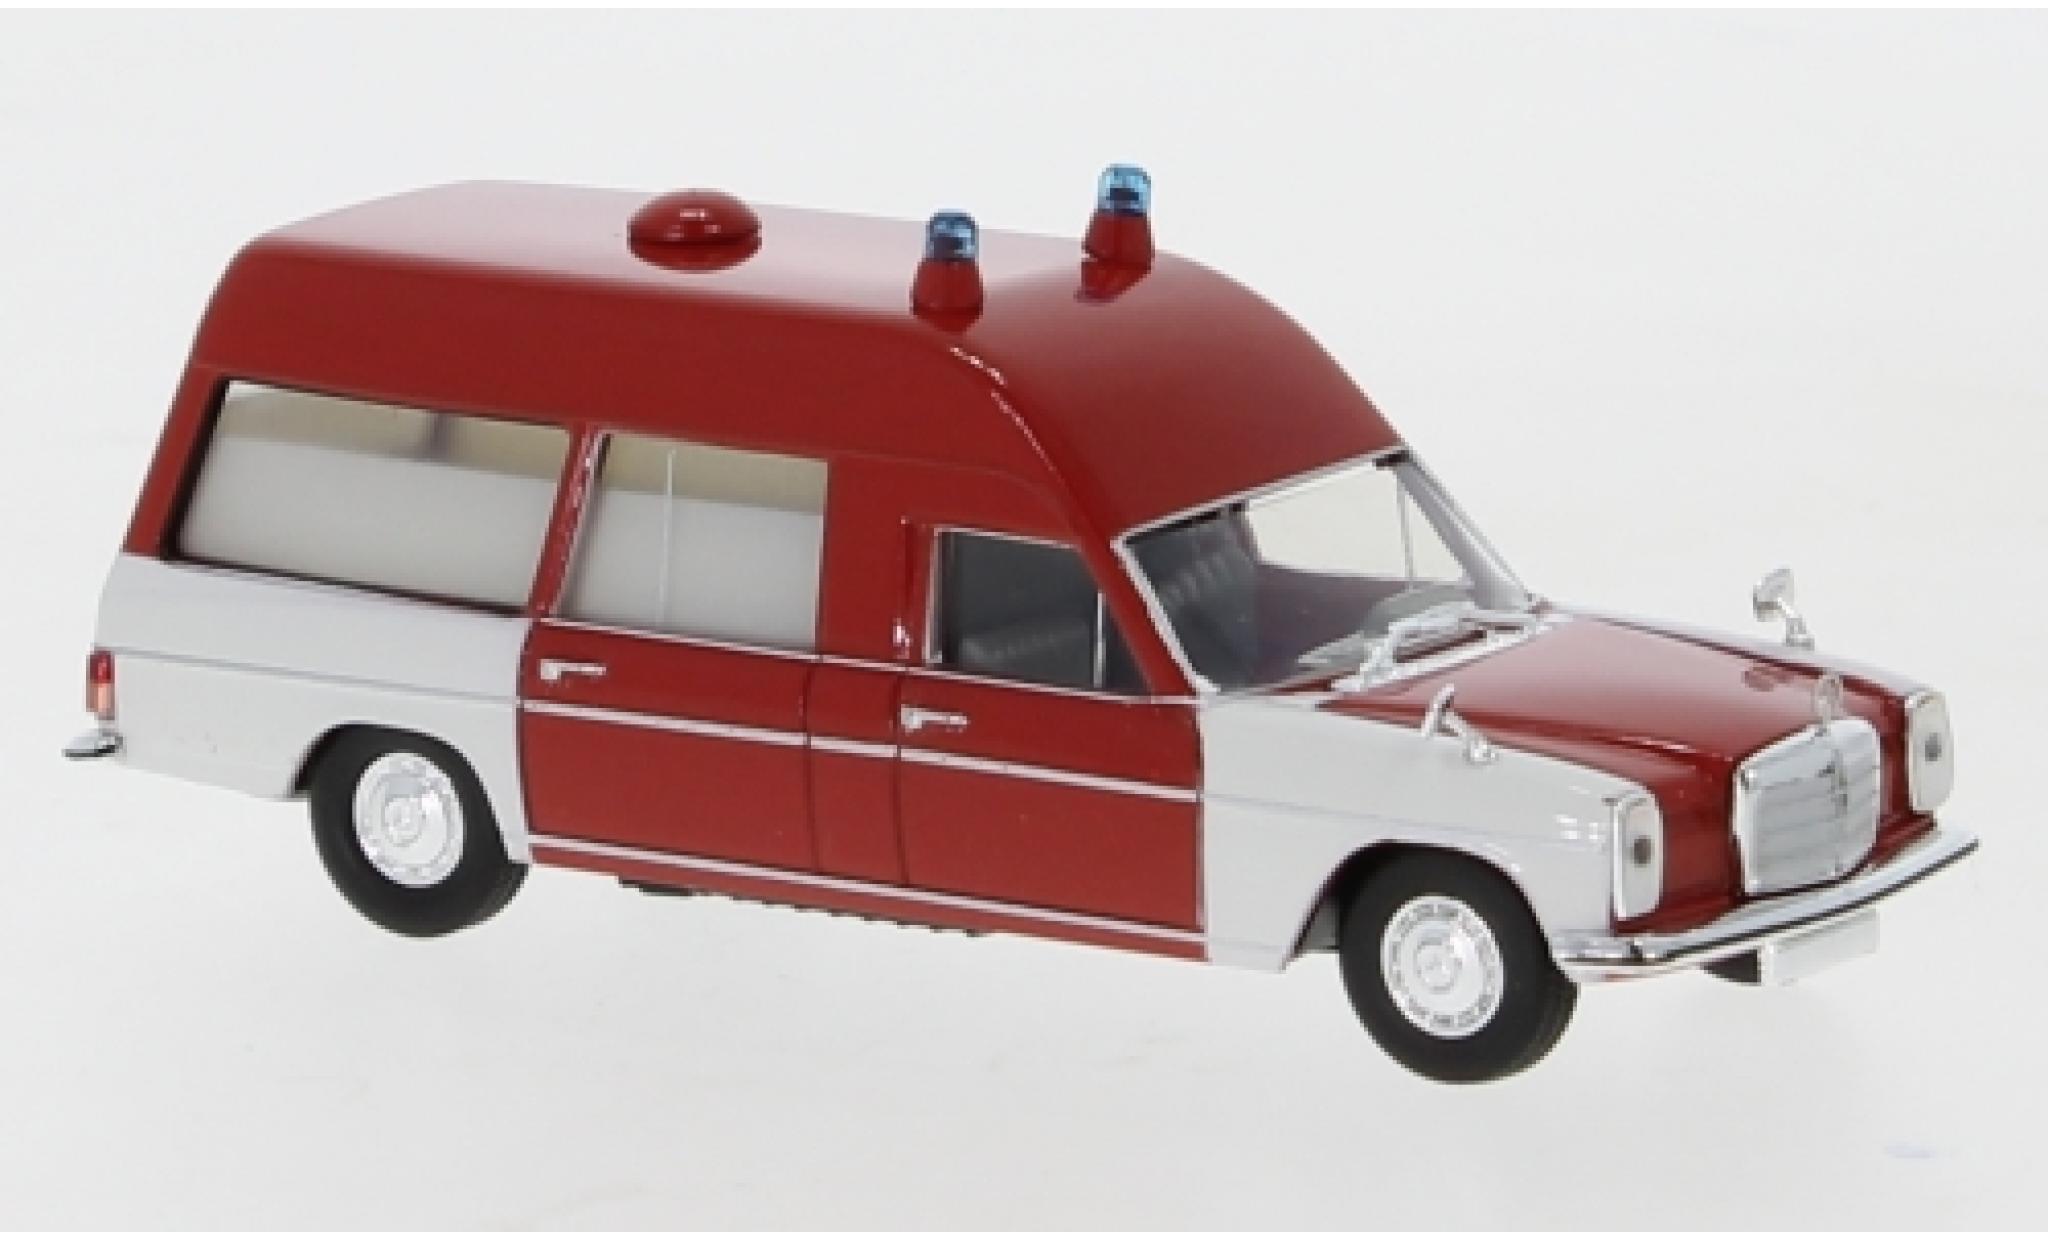 Mercedes /8 1/87 Brekina KTW rouge/blanche 1970